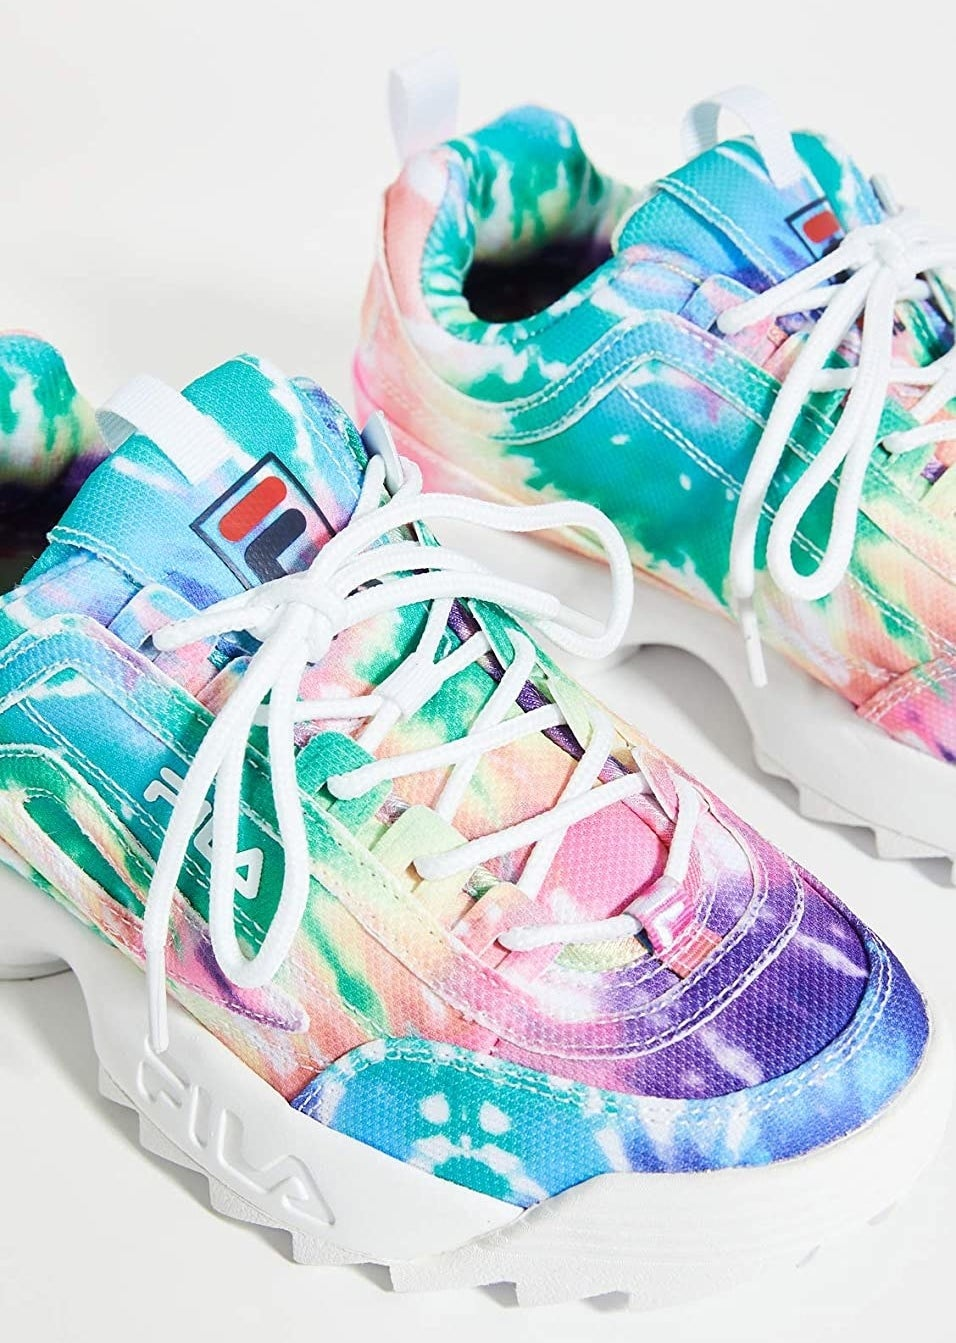 The tie-dye sneakers